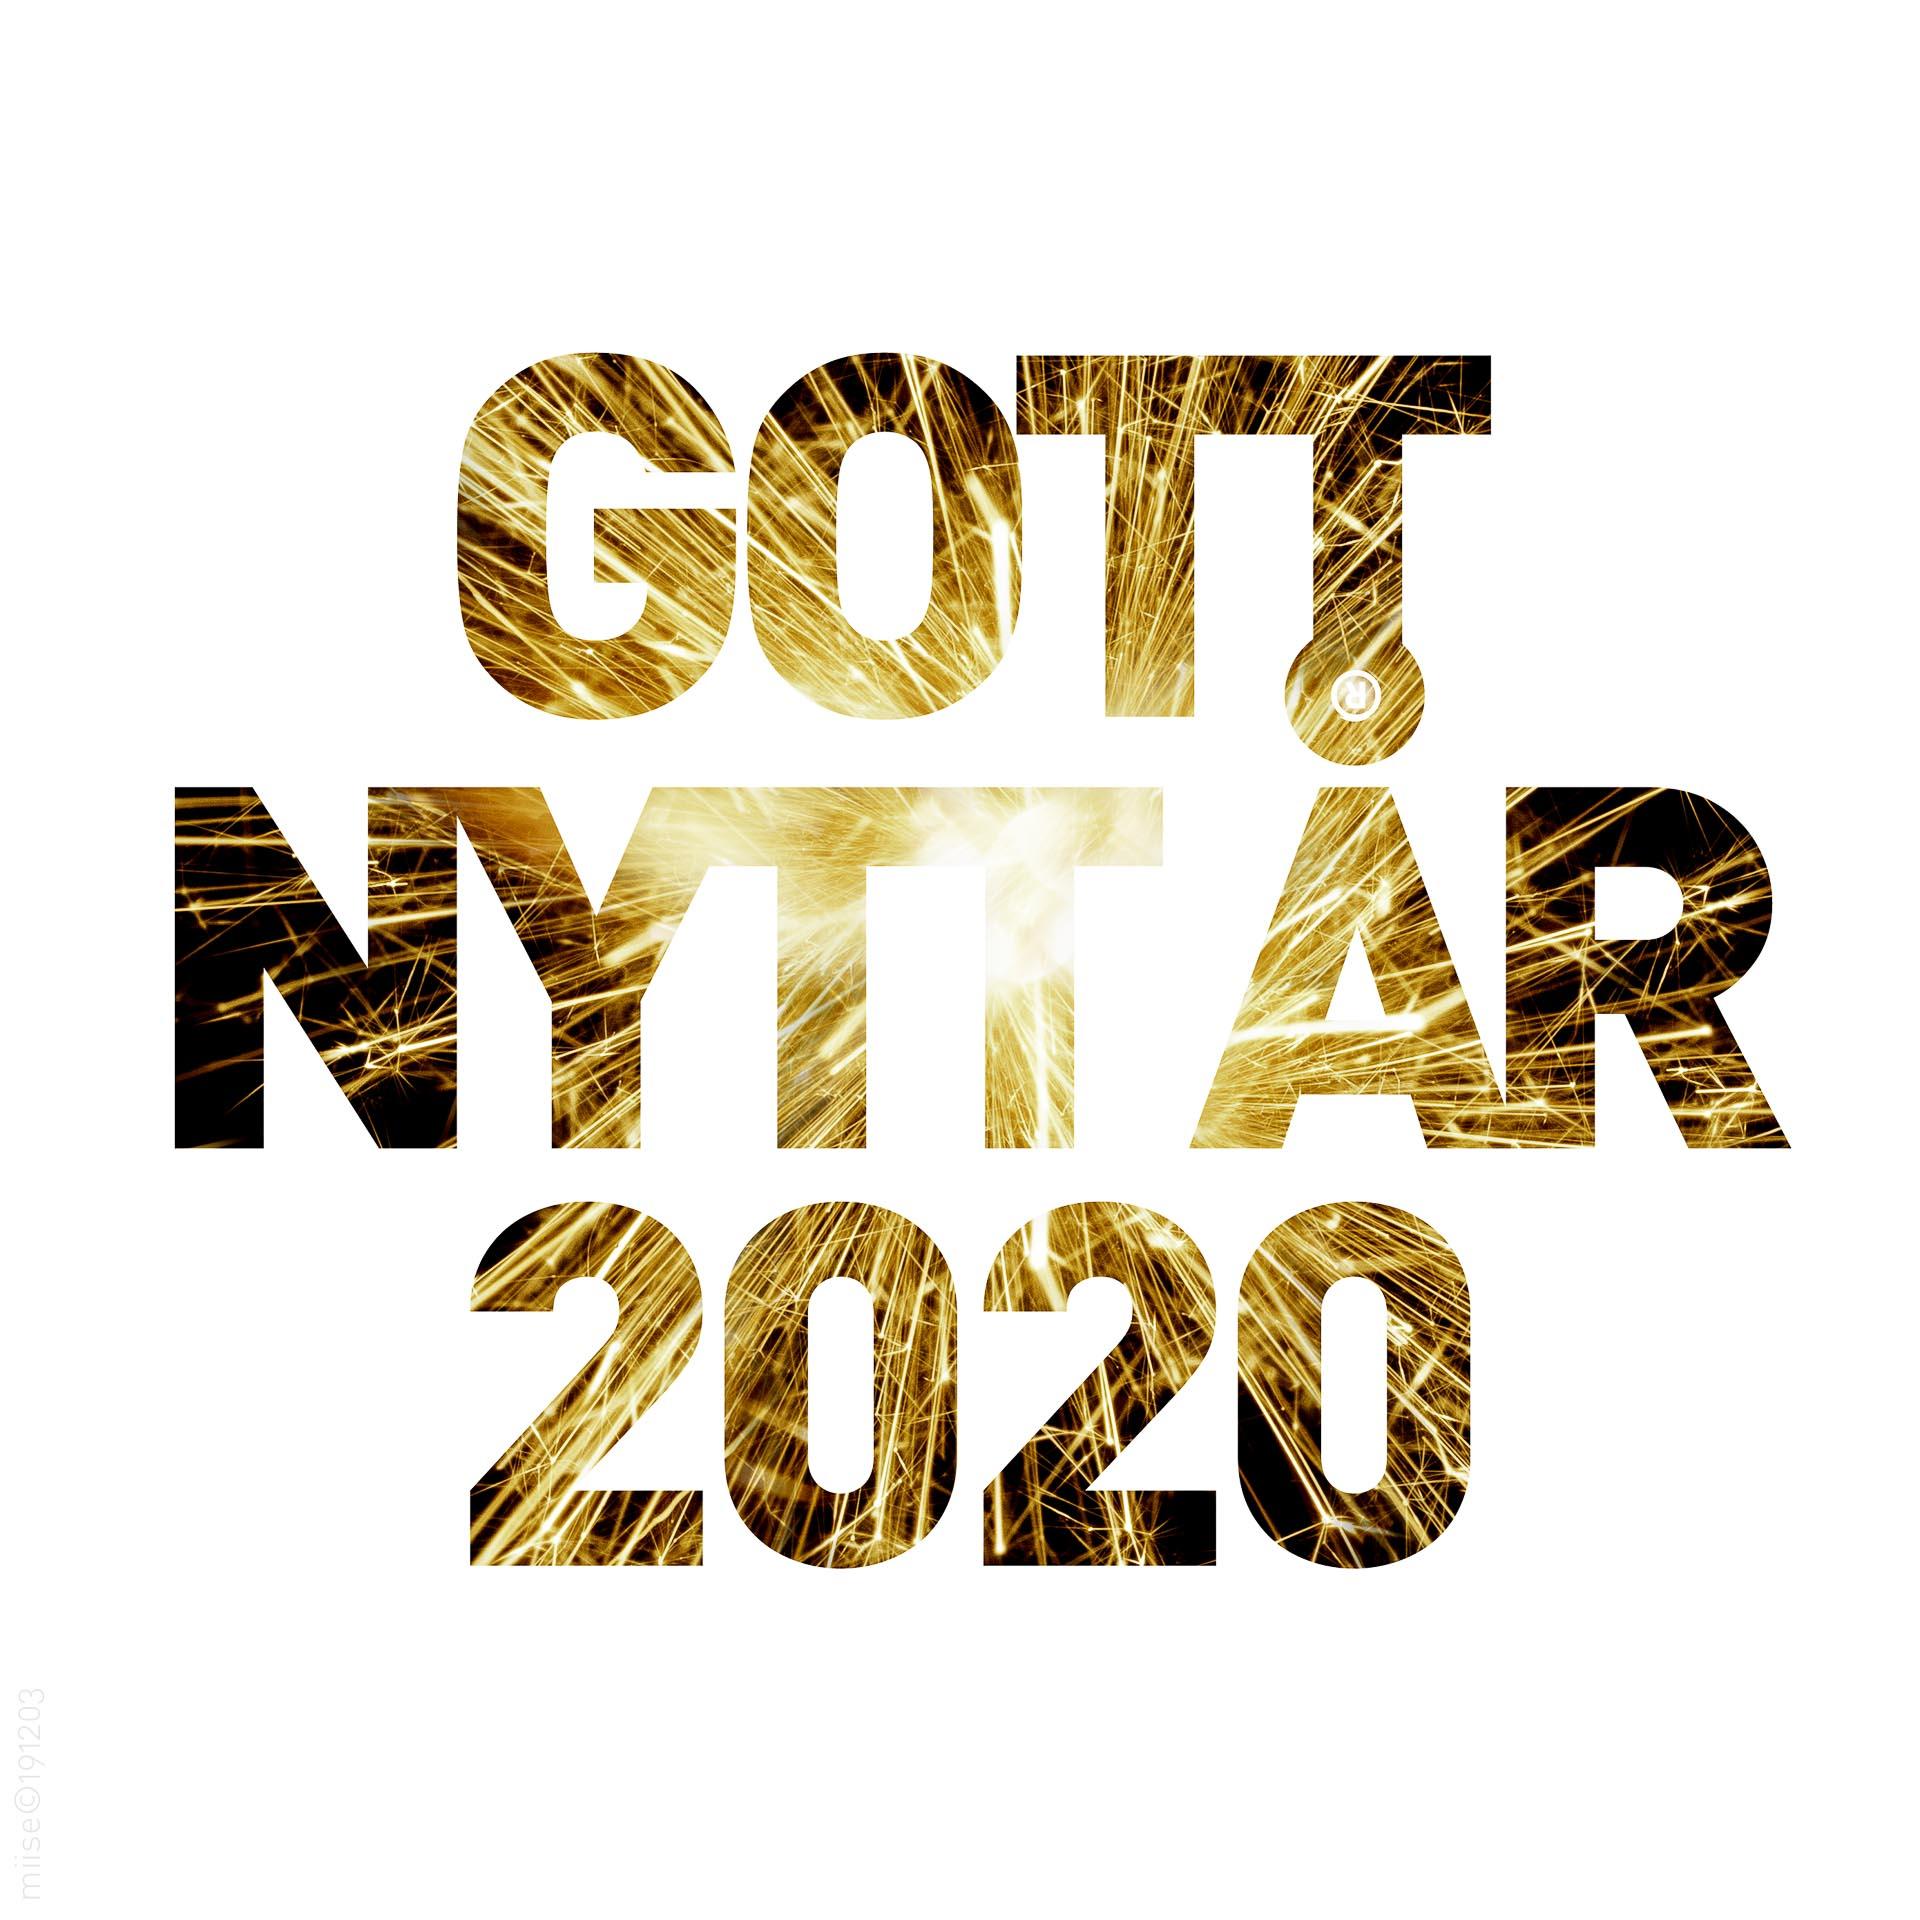 Gott nytt år 2020